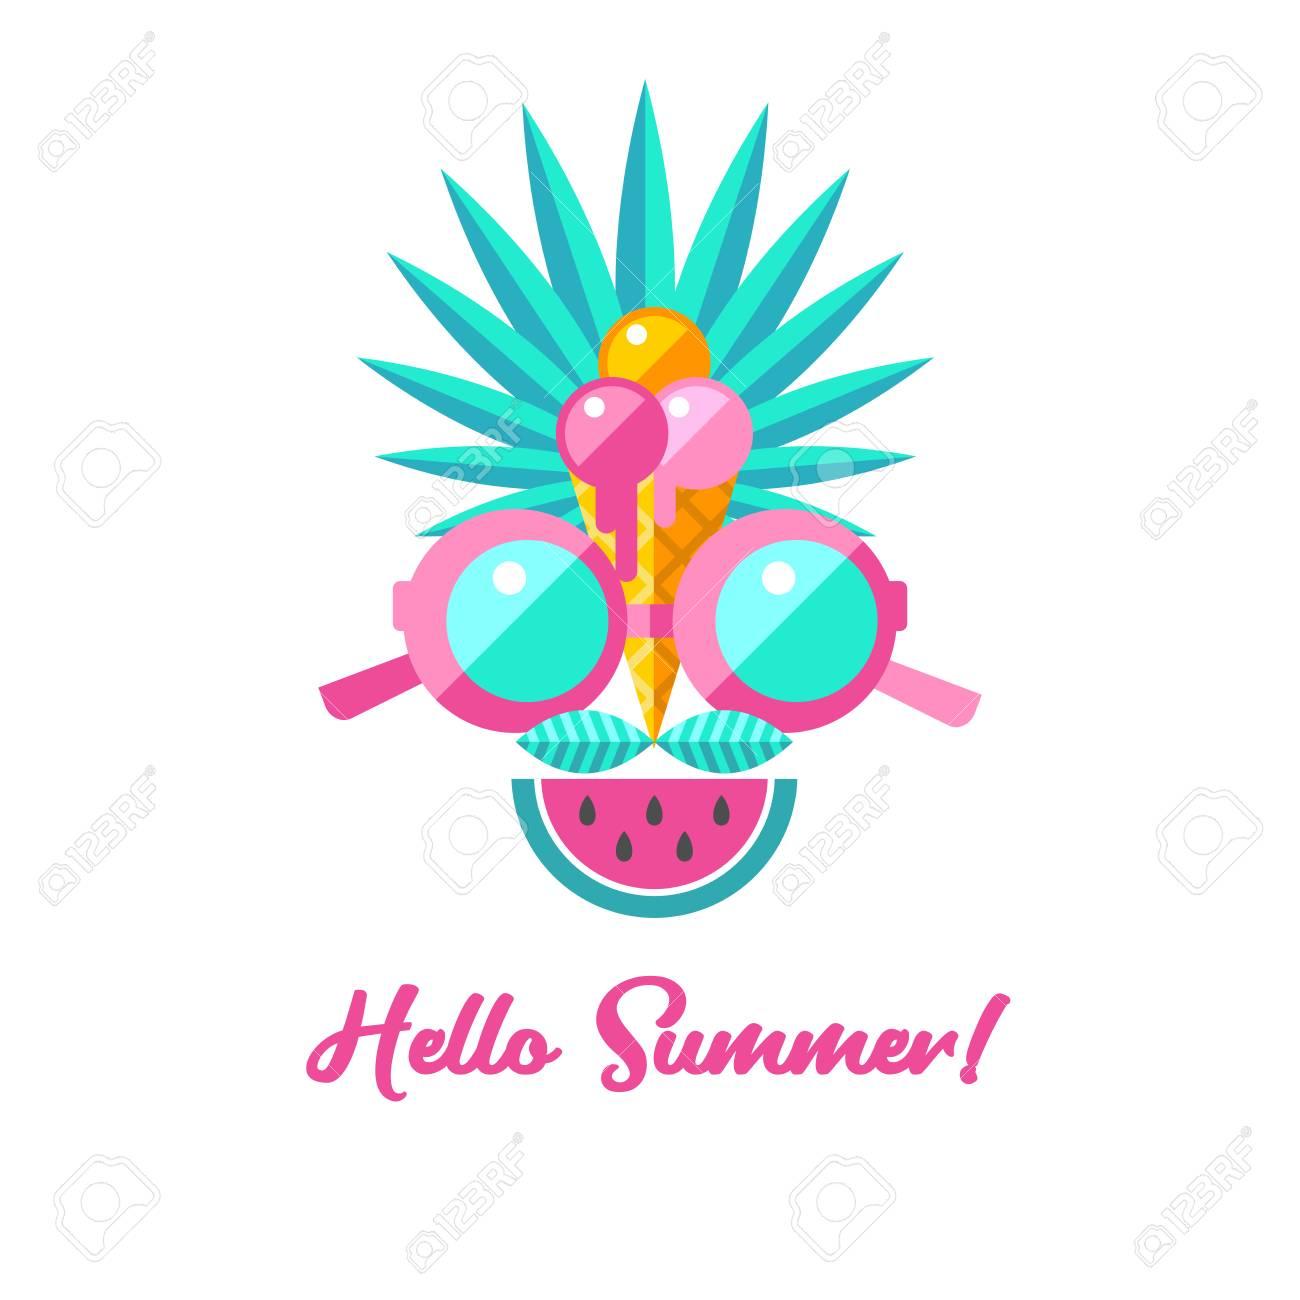 hello summer vector illustration a set of clipart on the theme rh 123rf com summer vector files summer vector art